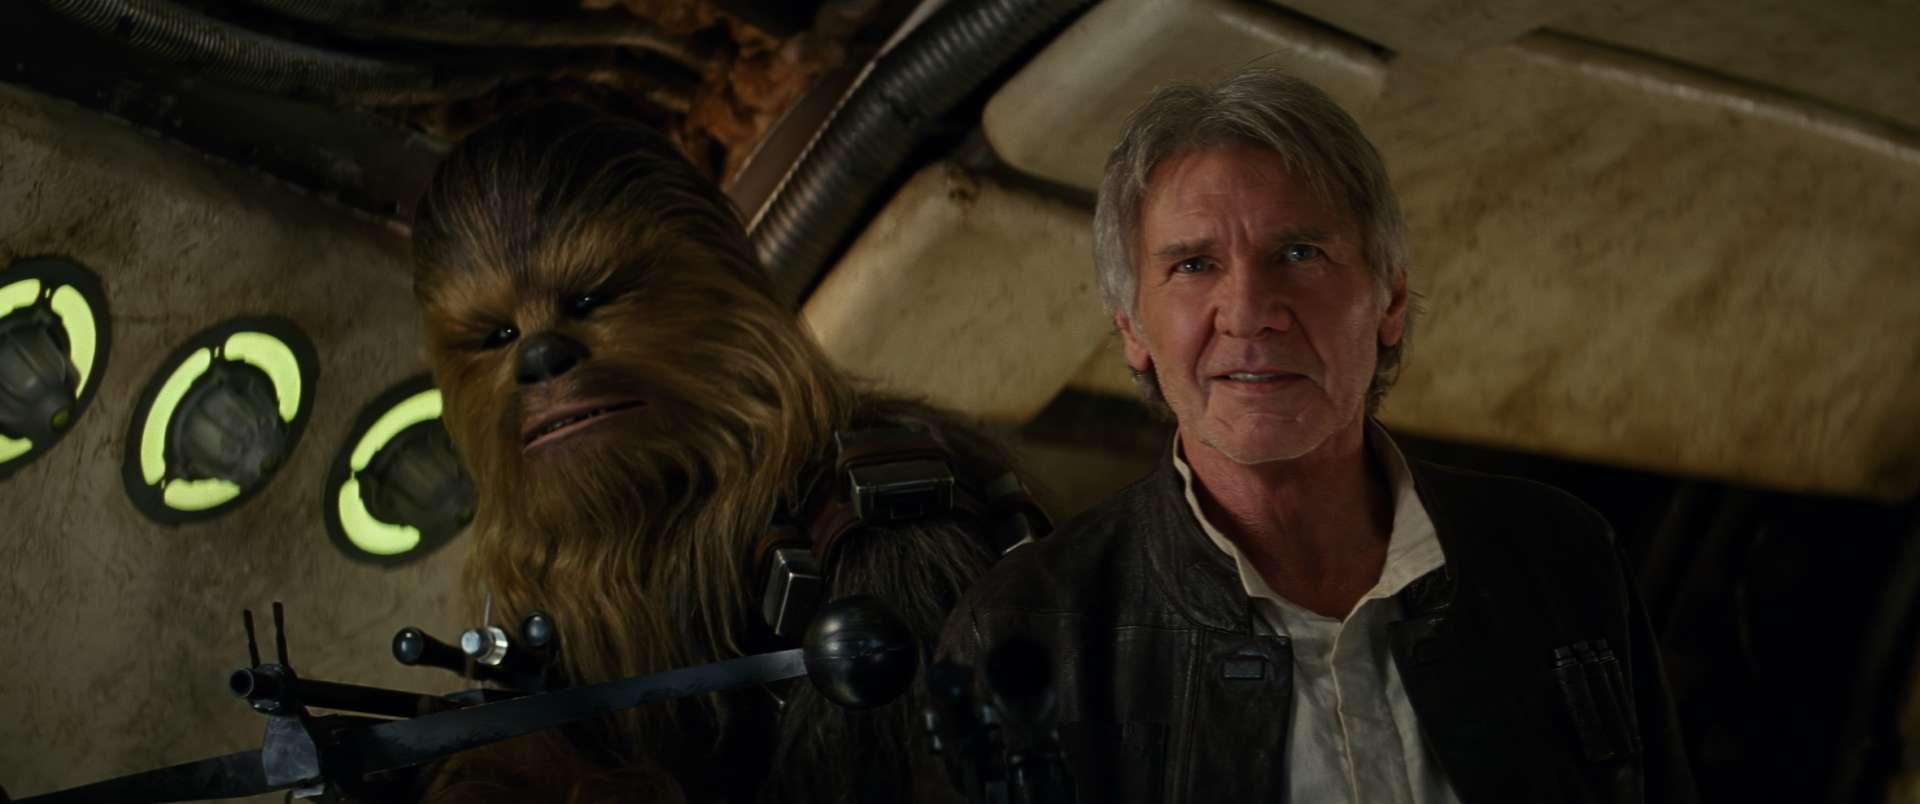 Star Wars Episode VII The Force Awakens Wallpaper 010